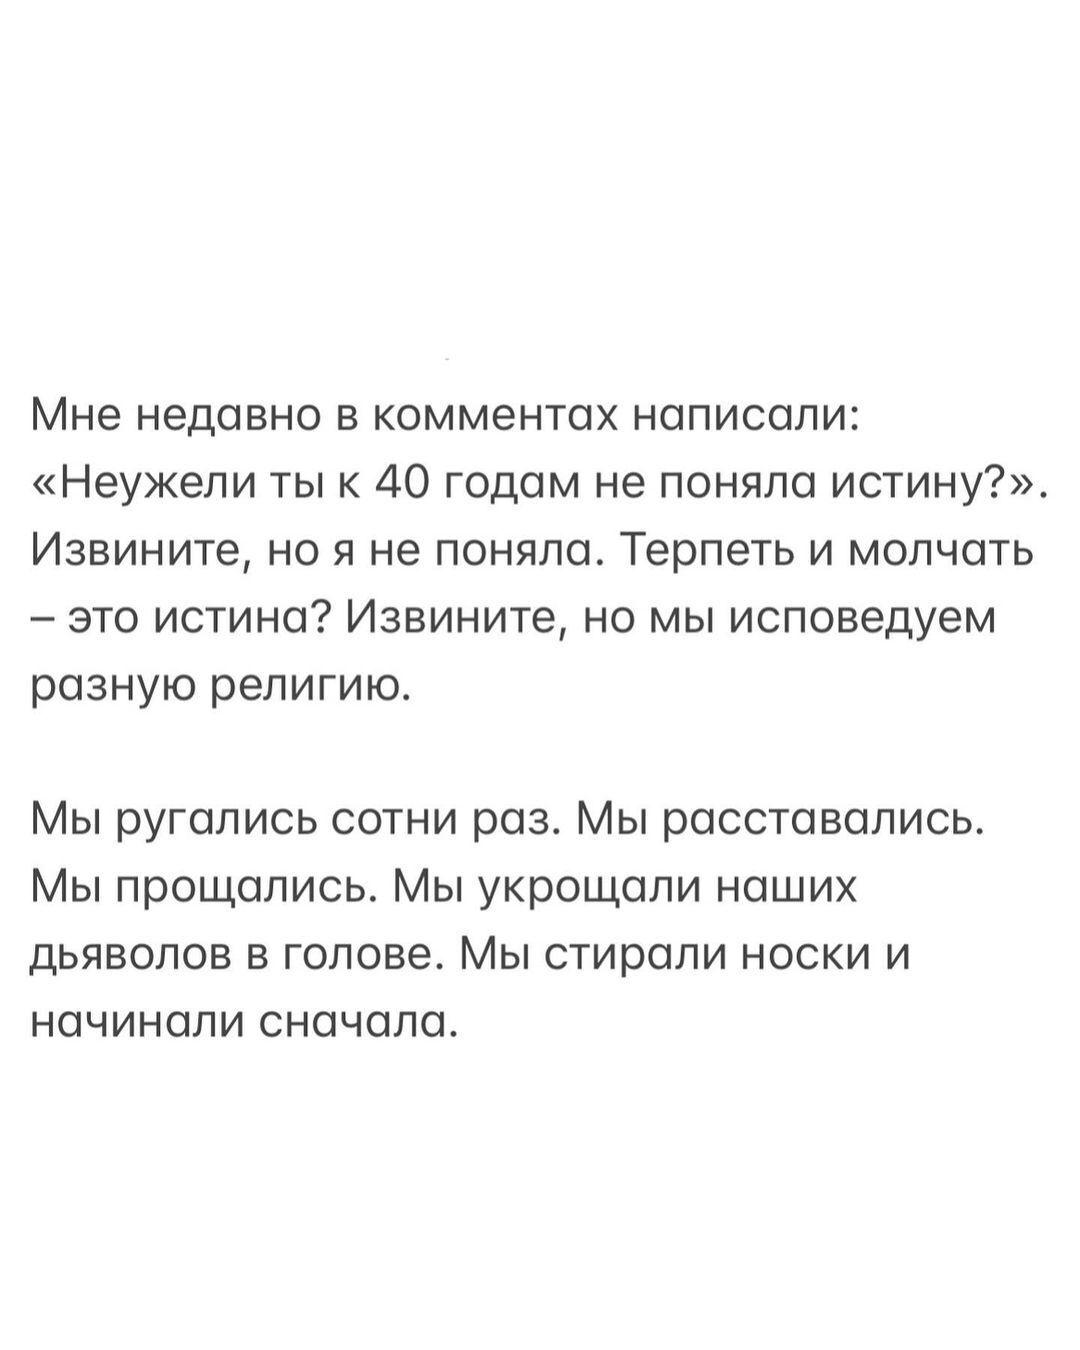 Публикация певицы.